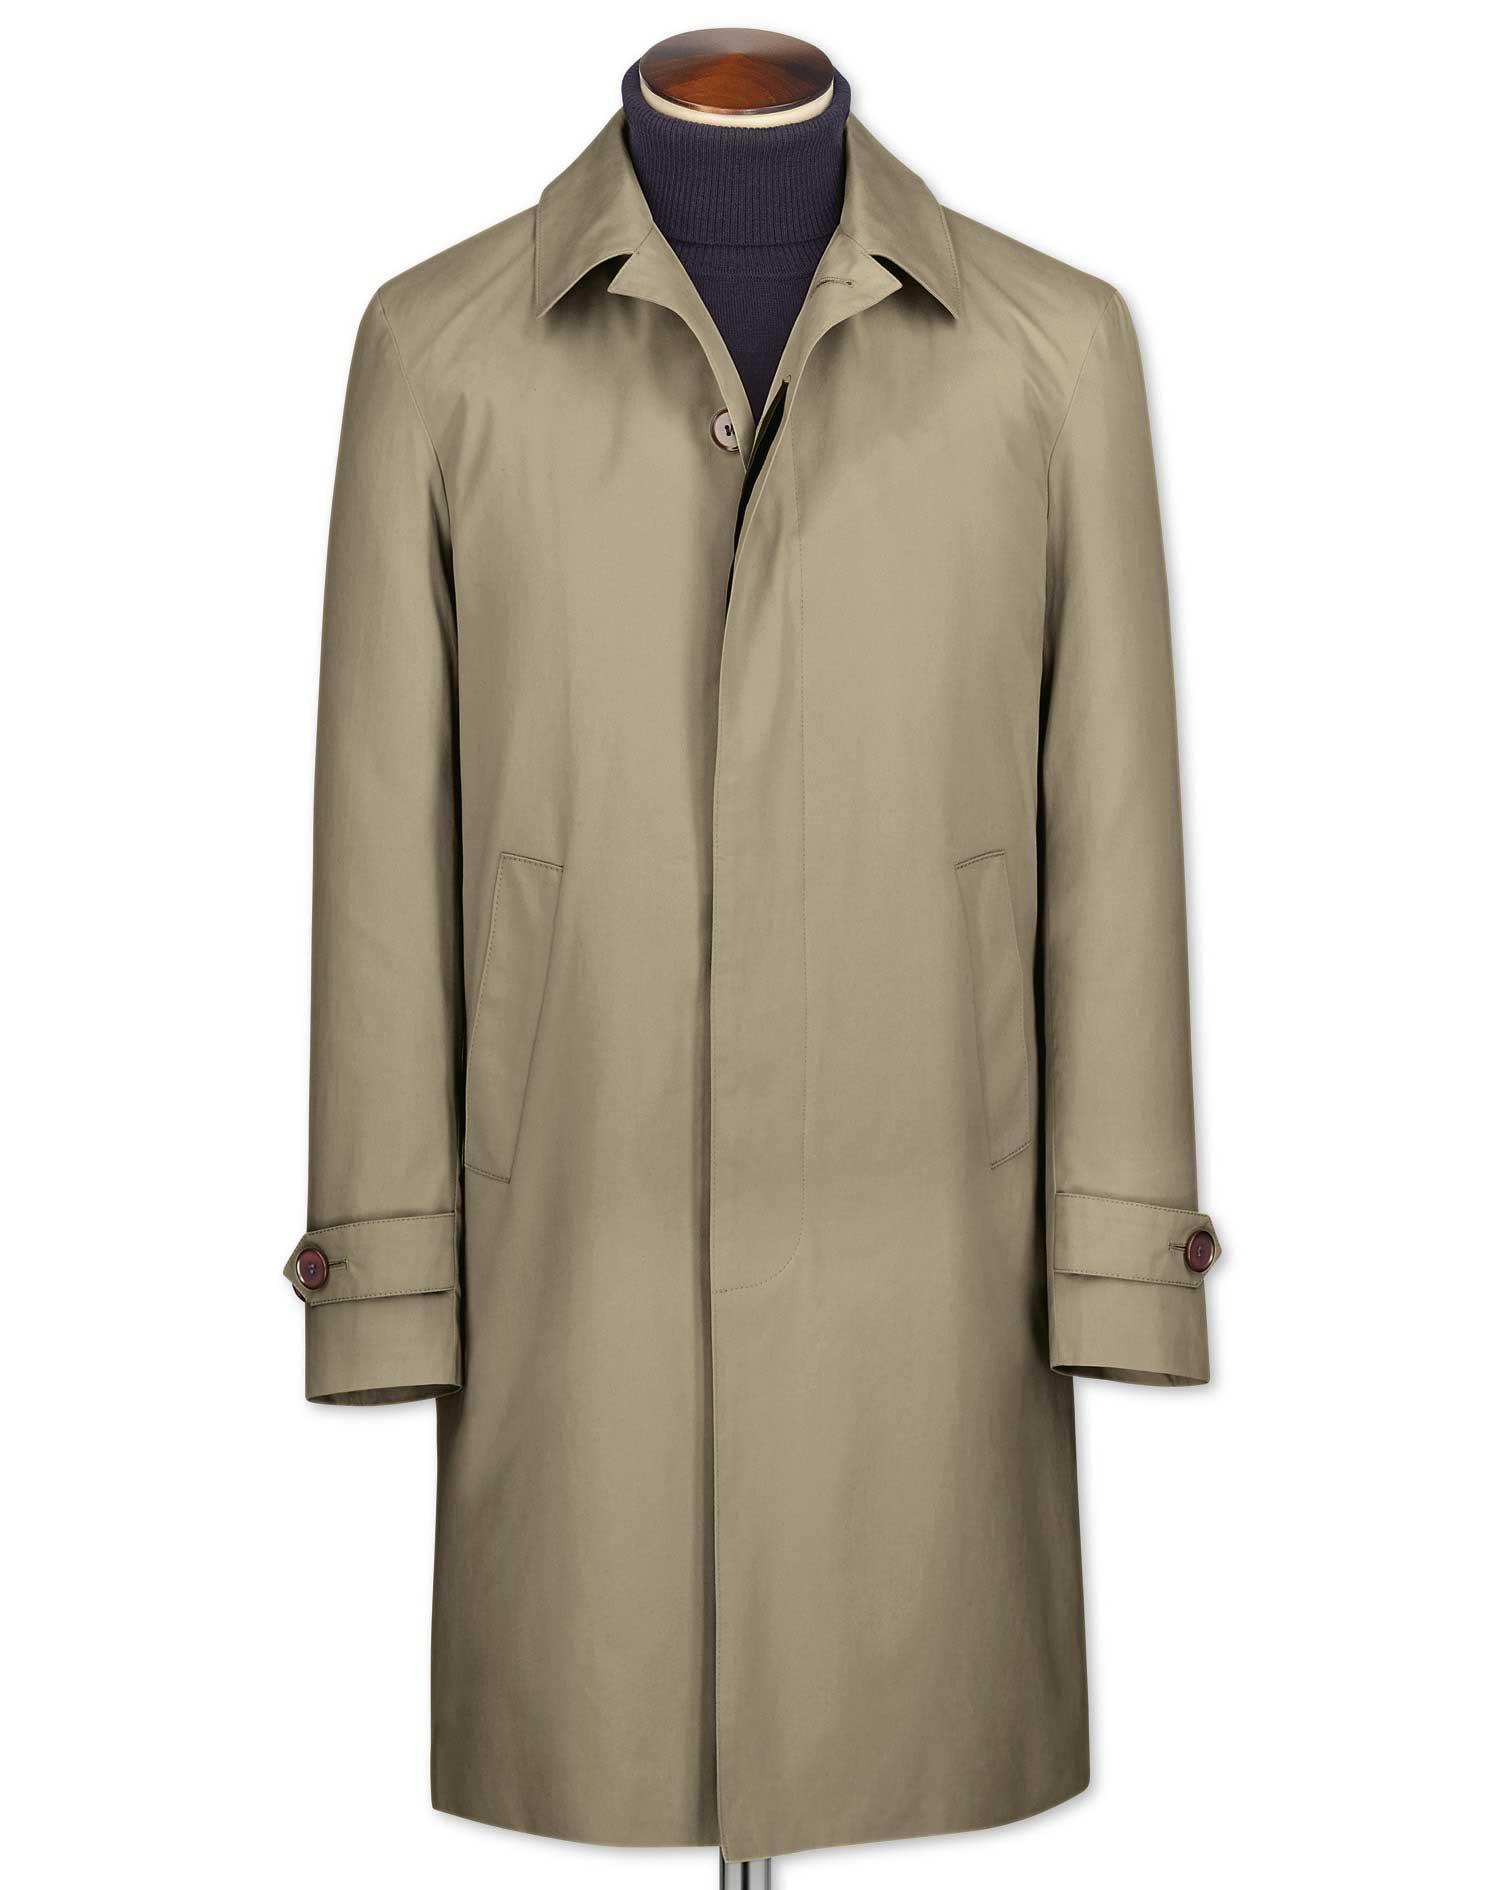 Slim Fit Stone RainCotton coat Size 48 Regular by Charles Tyrwhitt